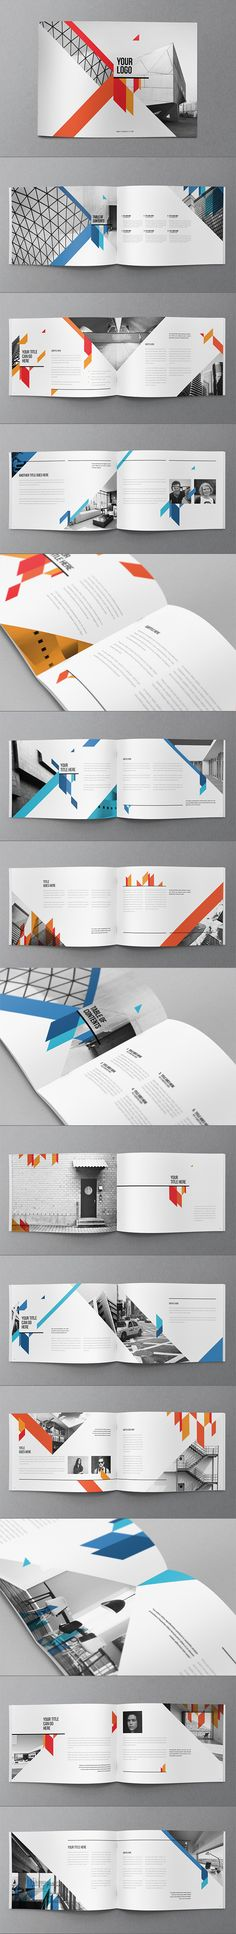 Clean Modern Red Blue Brochure on Behance